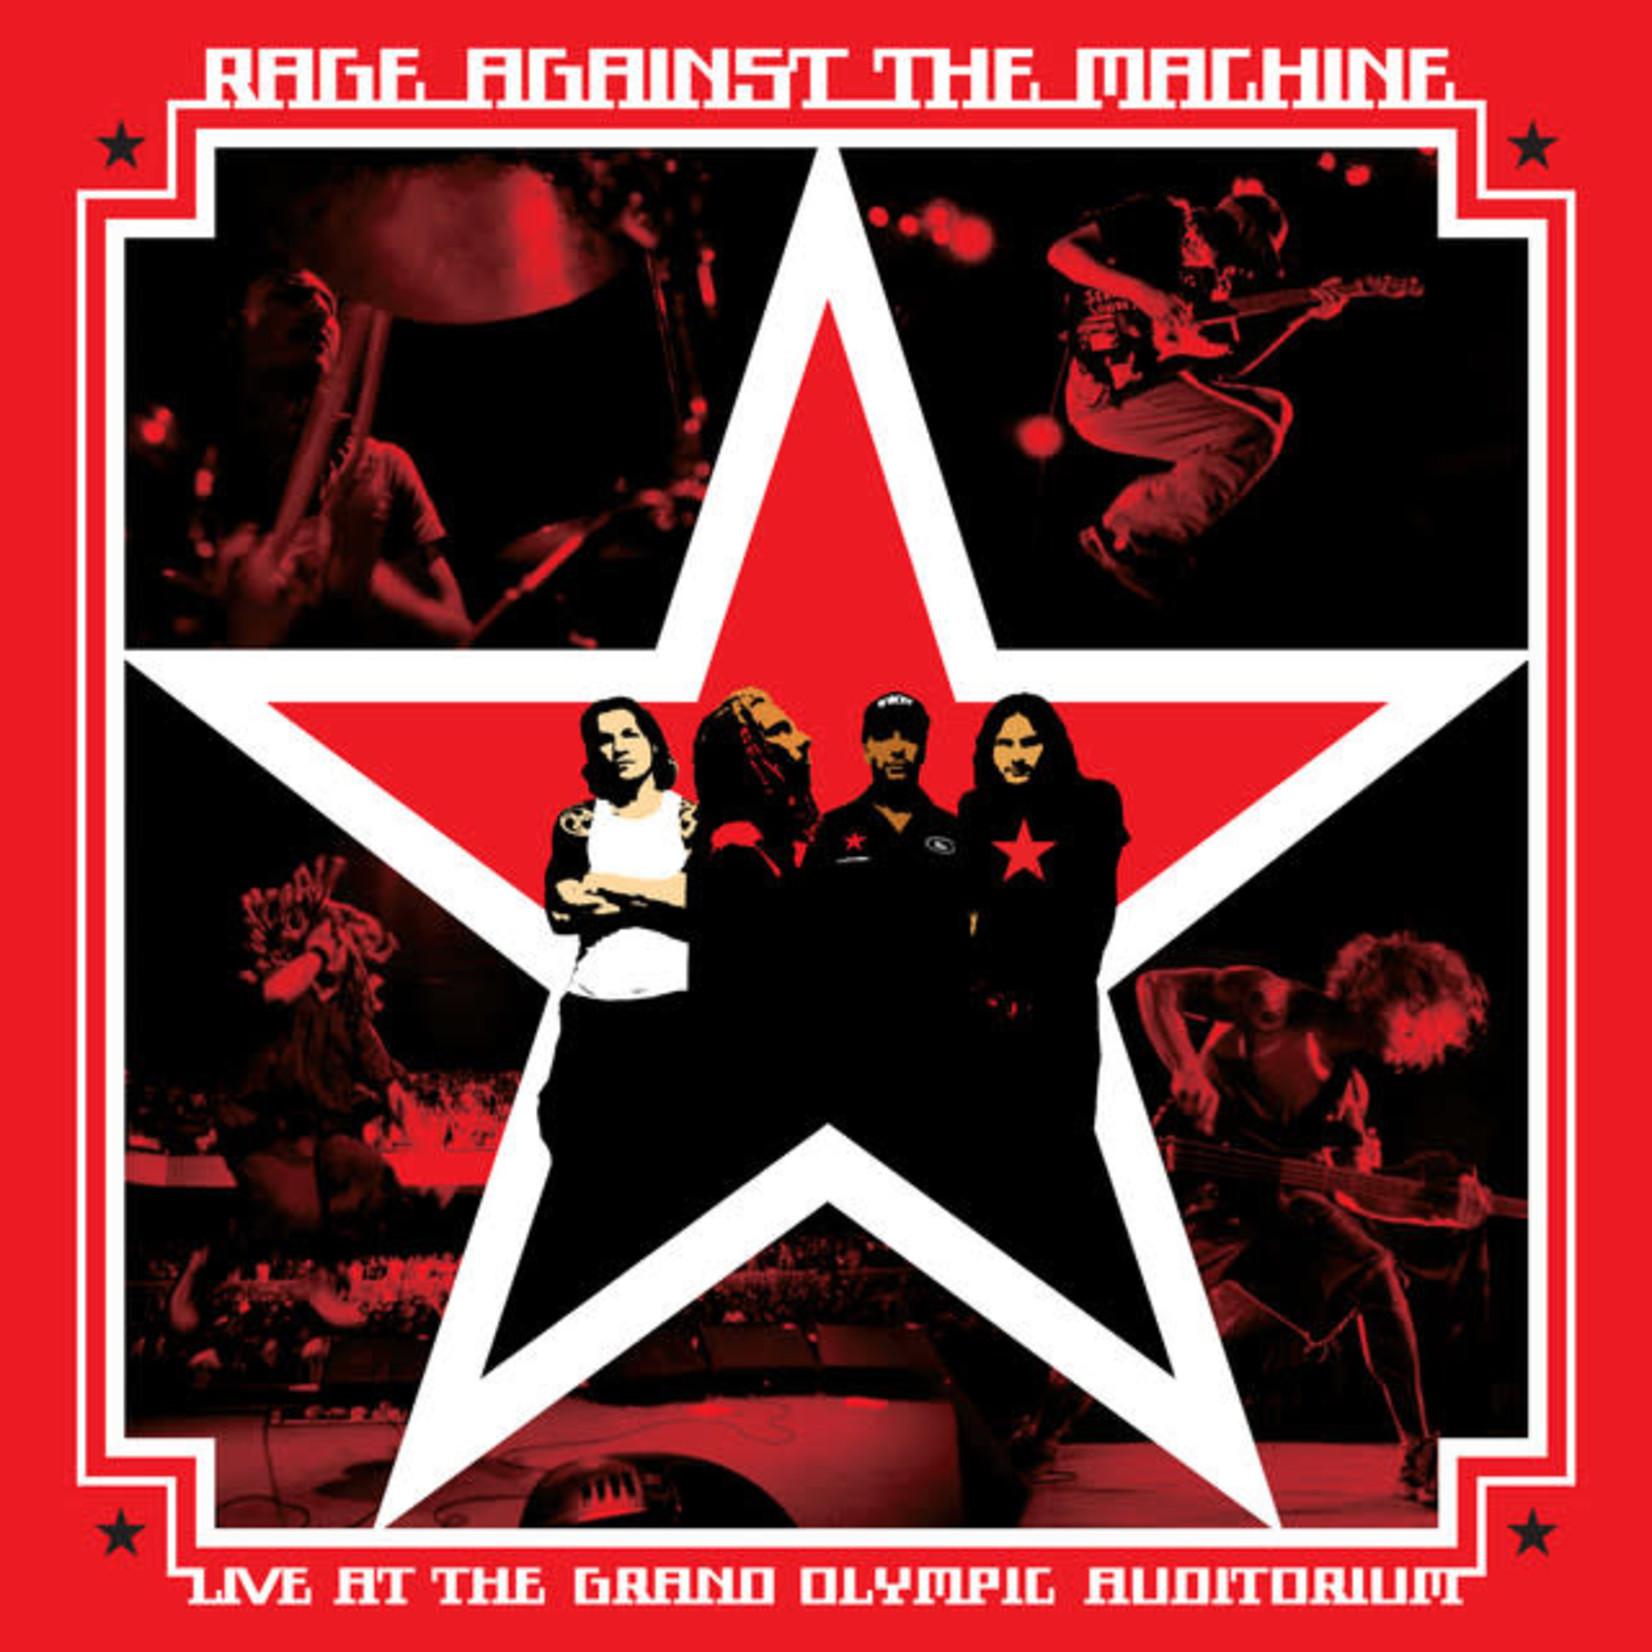 Vinyl Rage Against The Machine - Live At The Olympic Auditorium